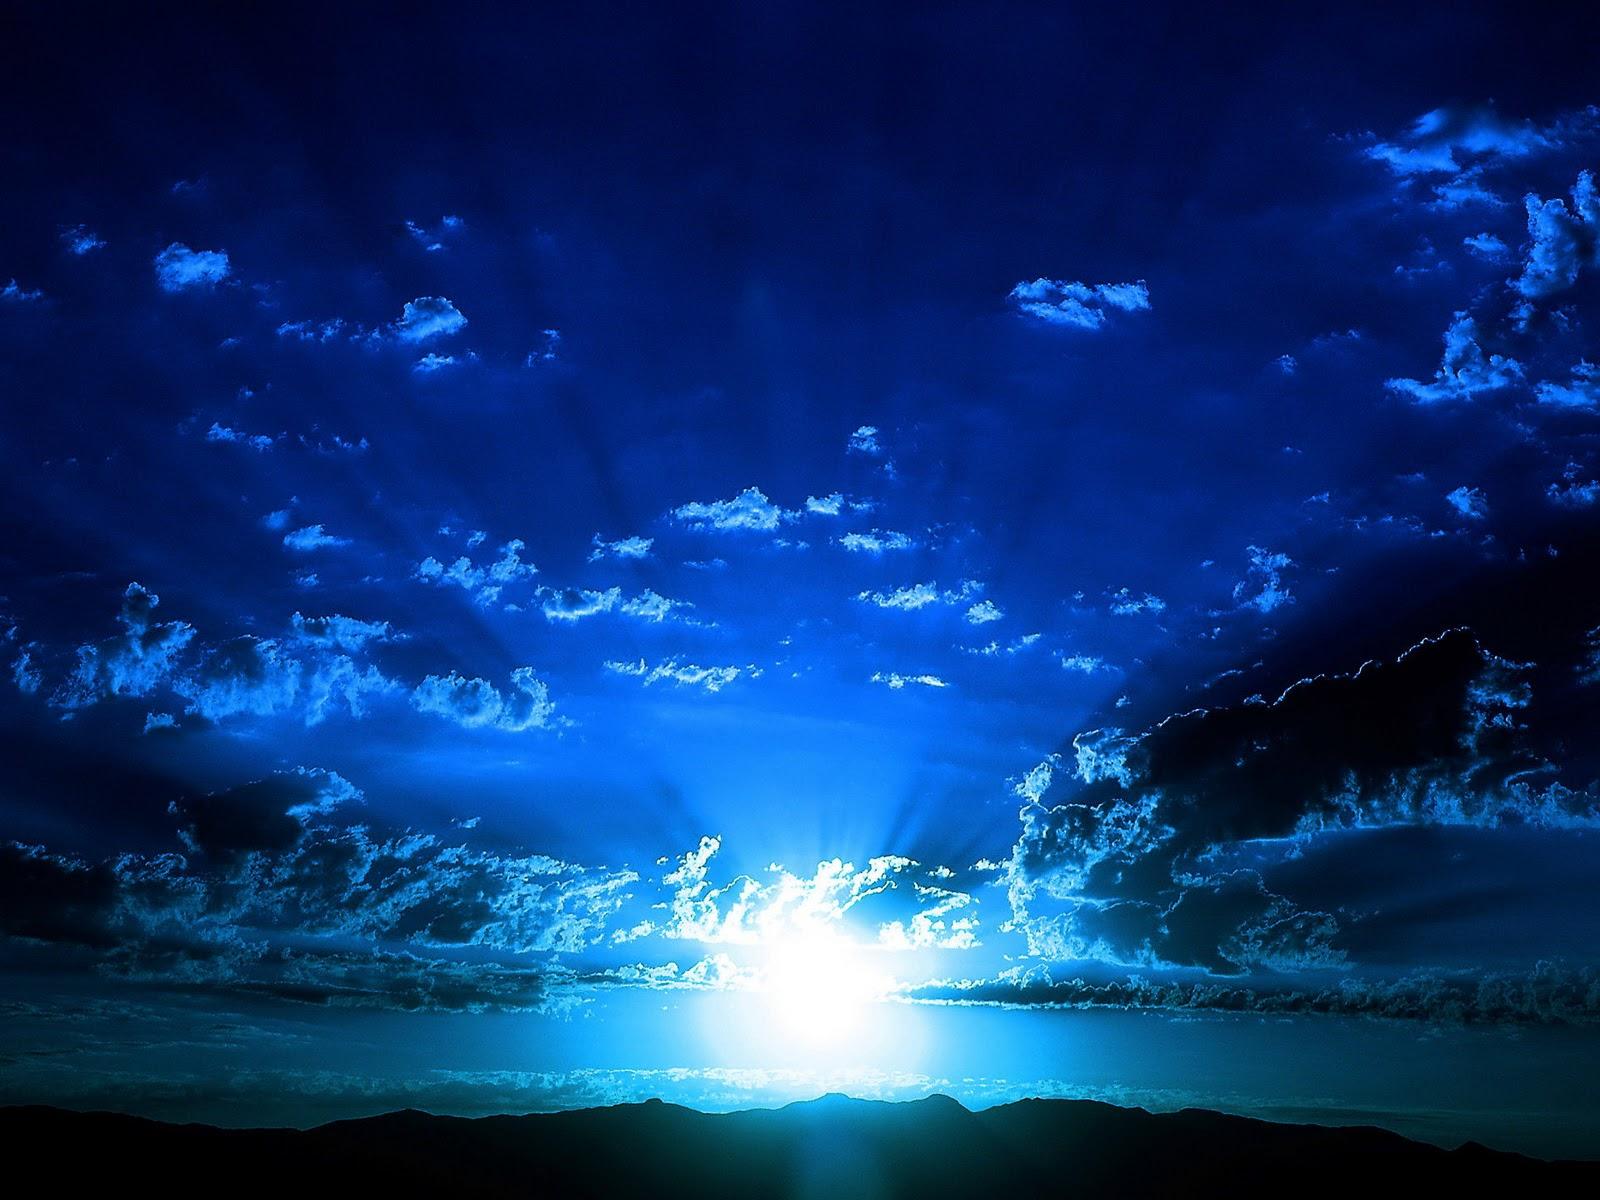 dark blue sky with - photo #17